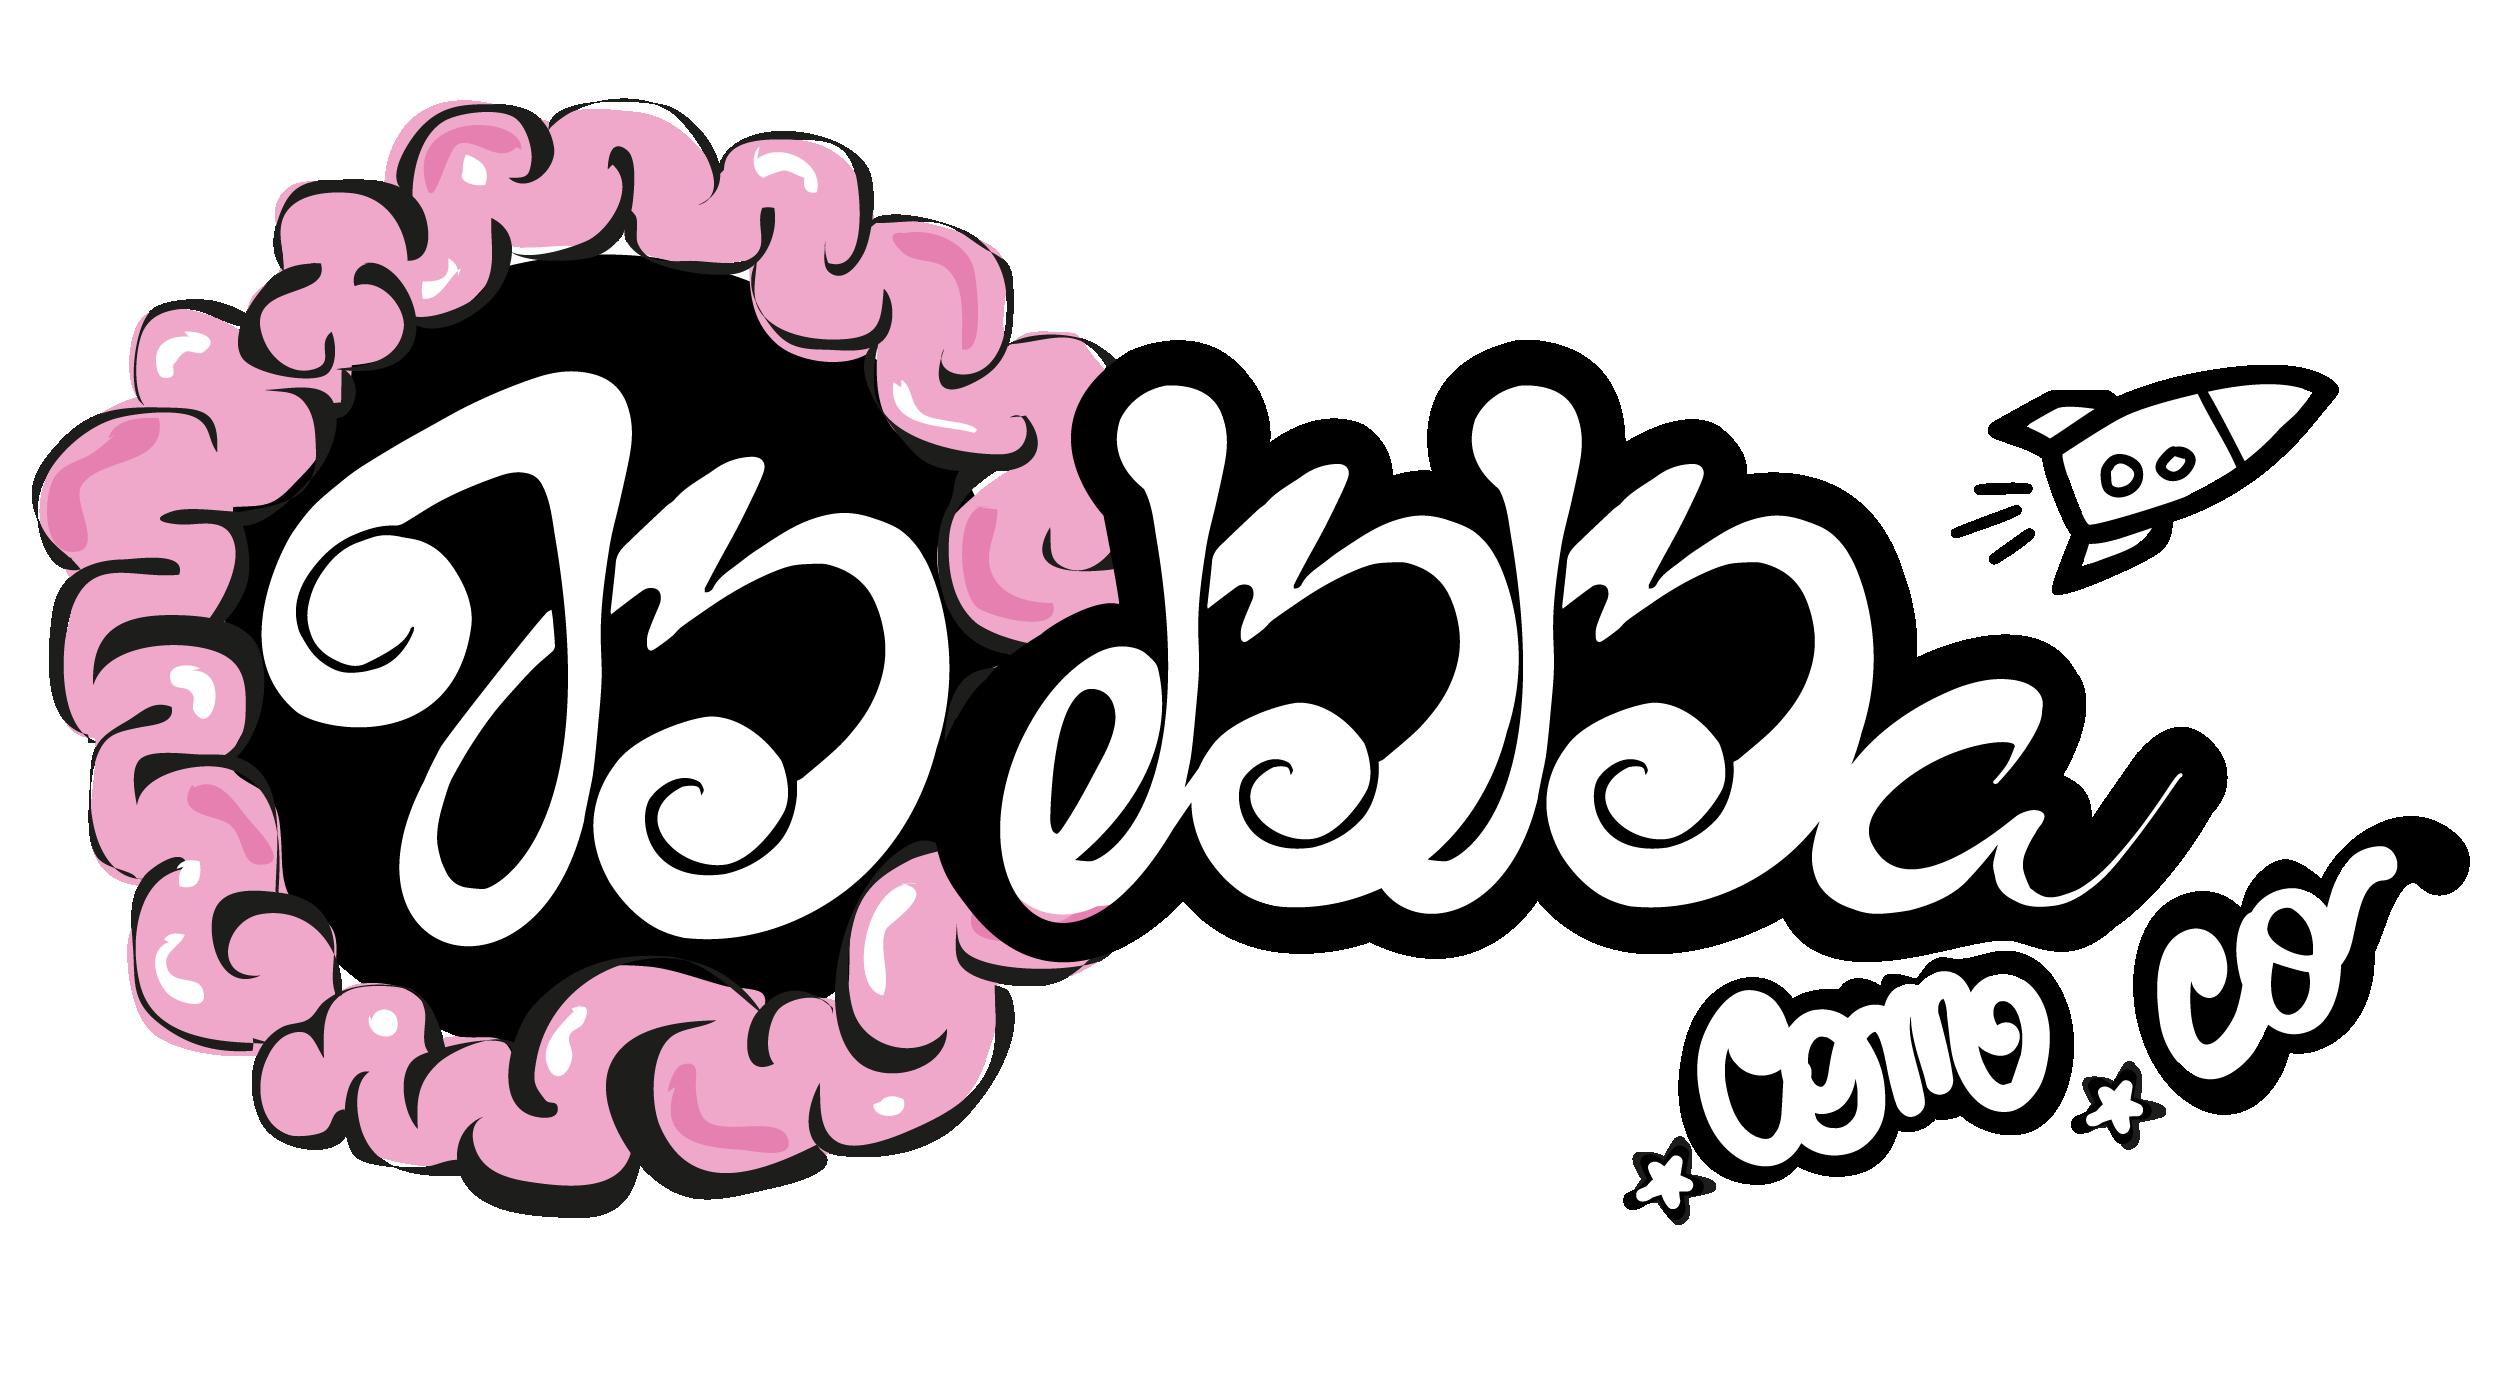 bebba.com.co